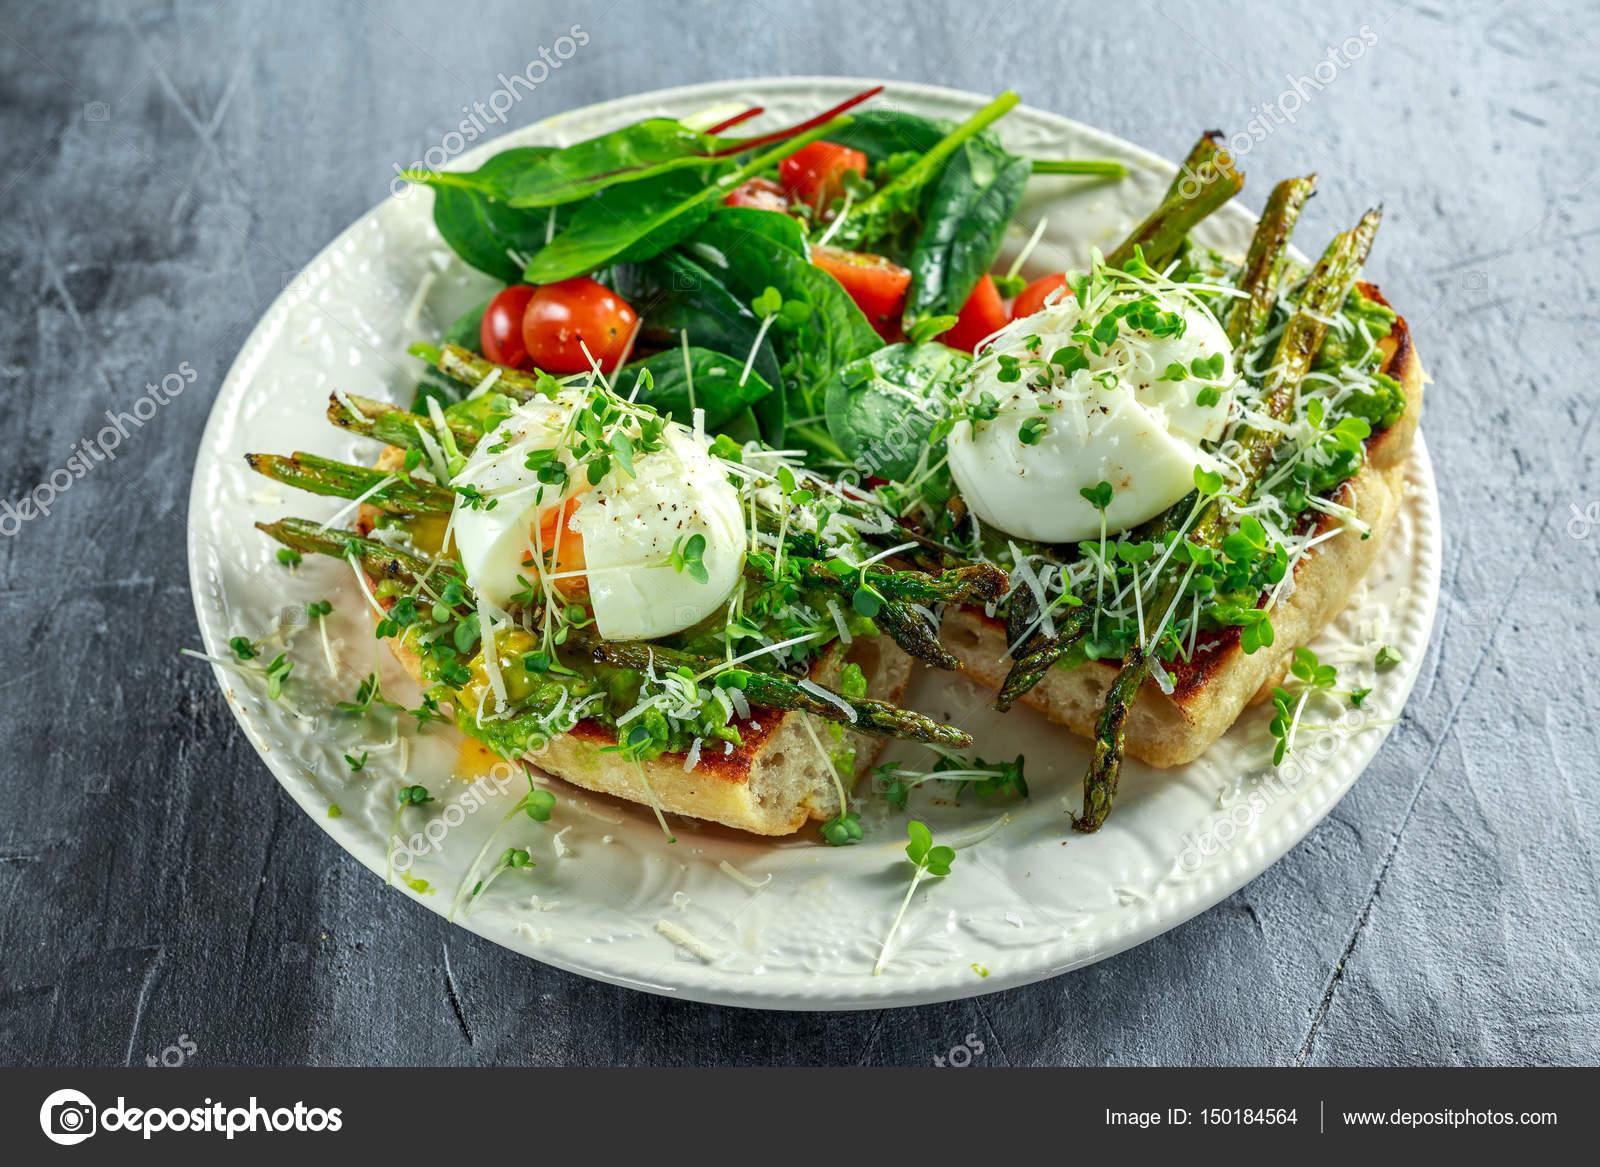 Kiraz domatesli salata